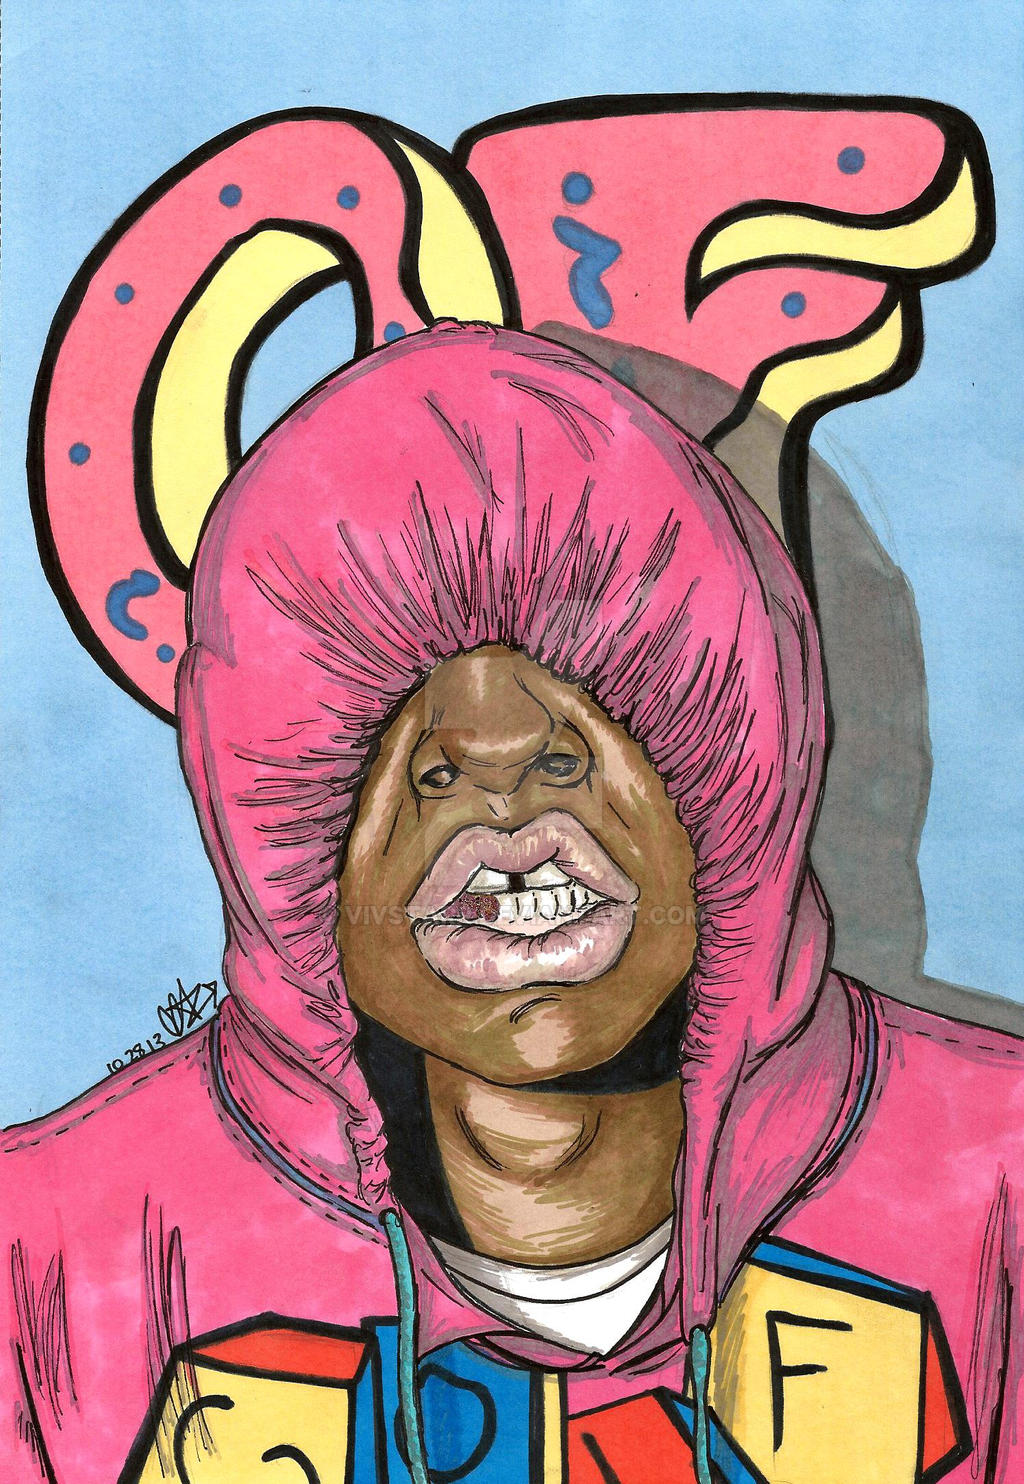 Goblin Tyler The Creator Wallpaper